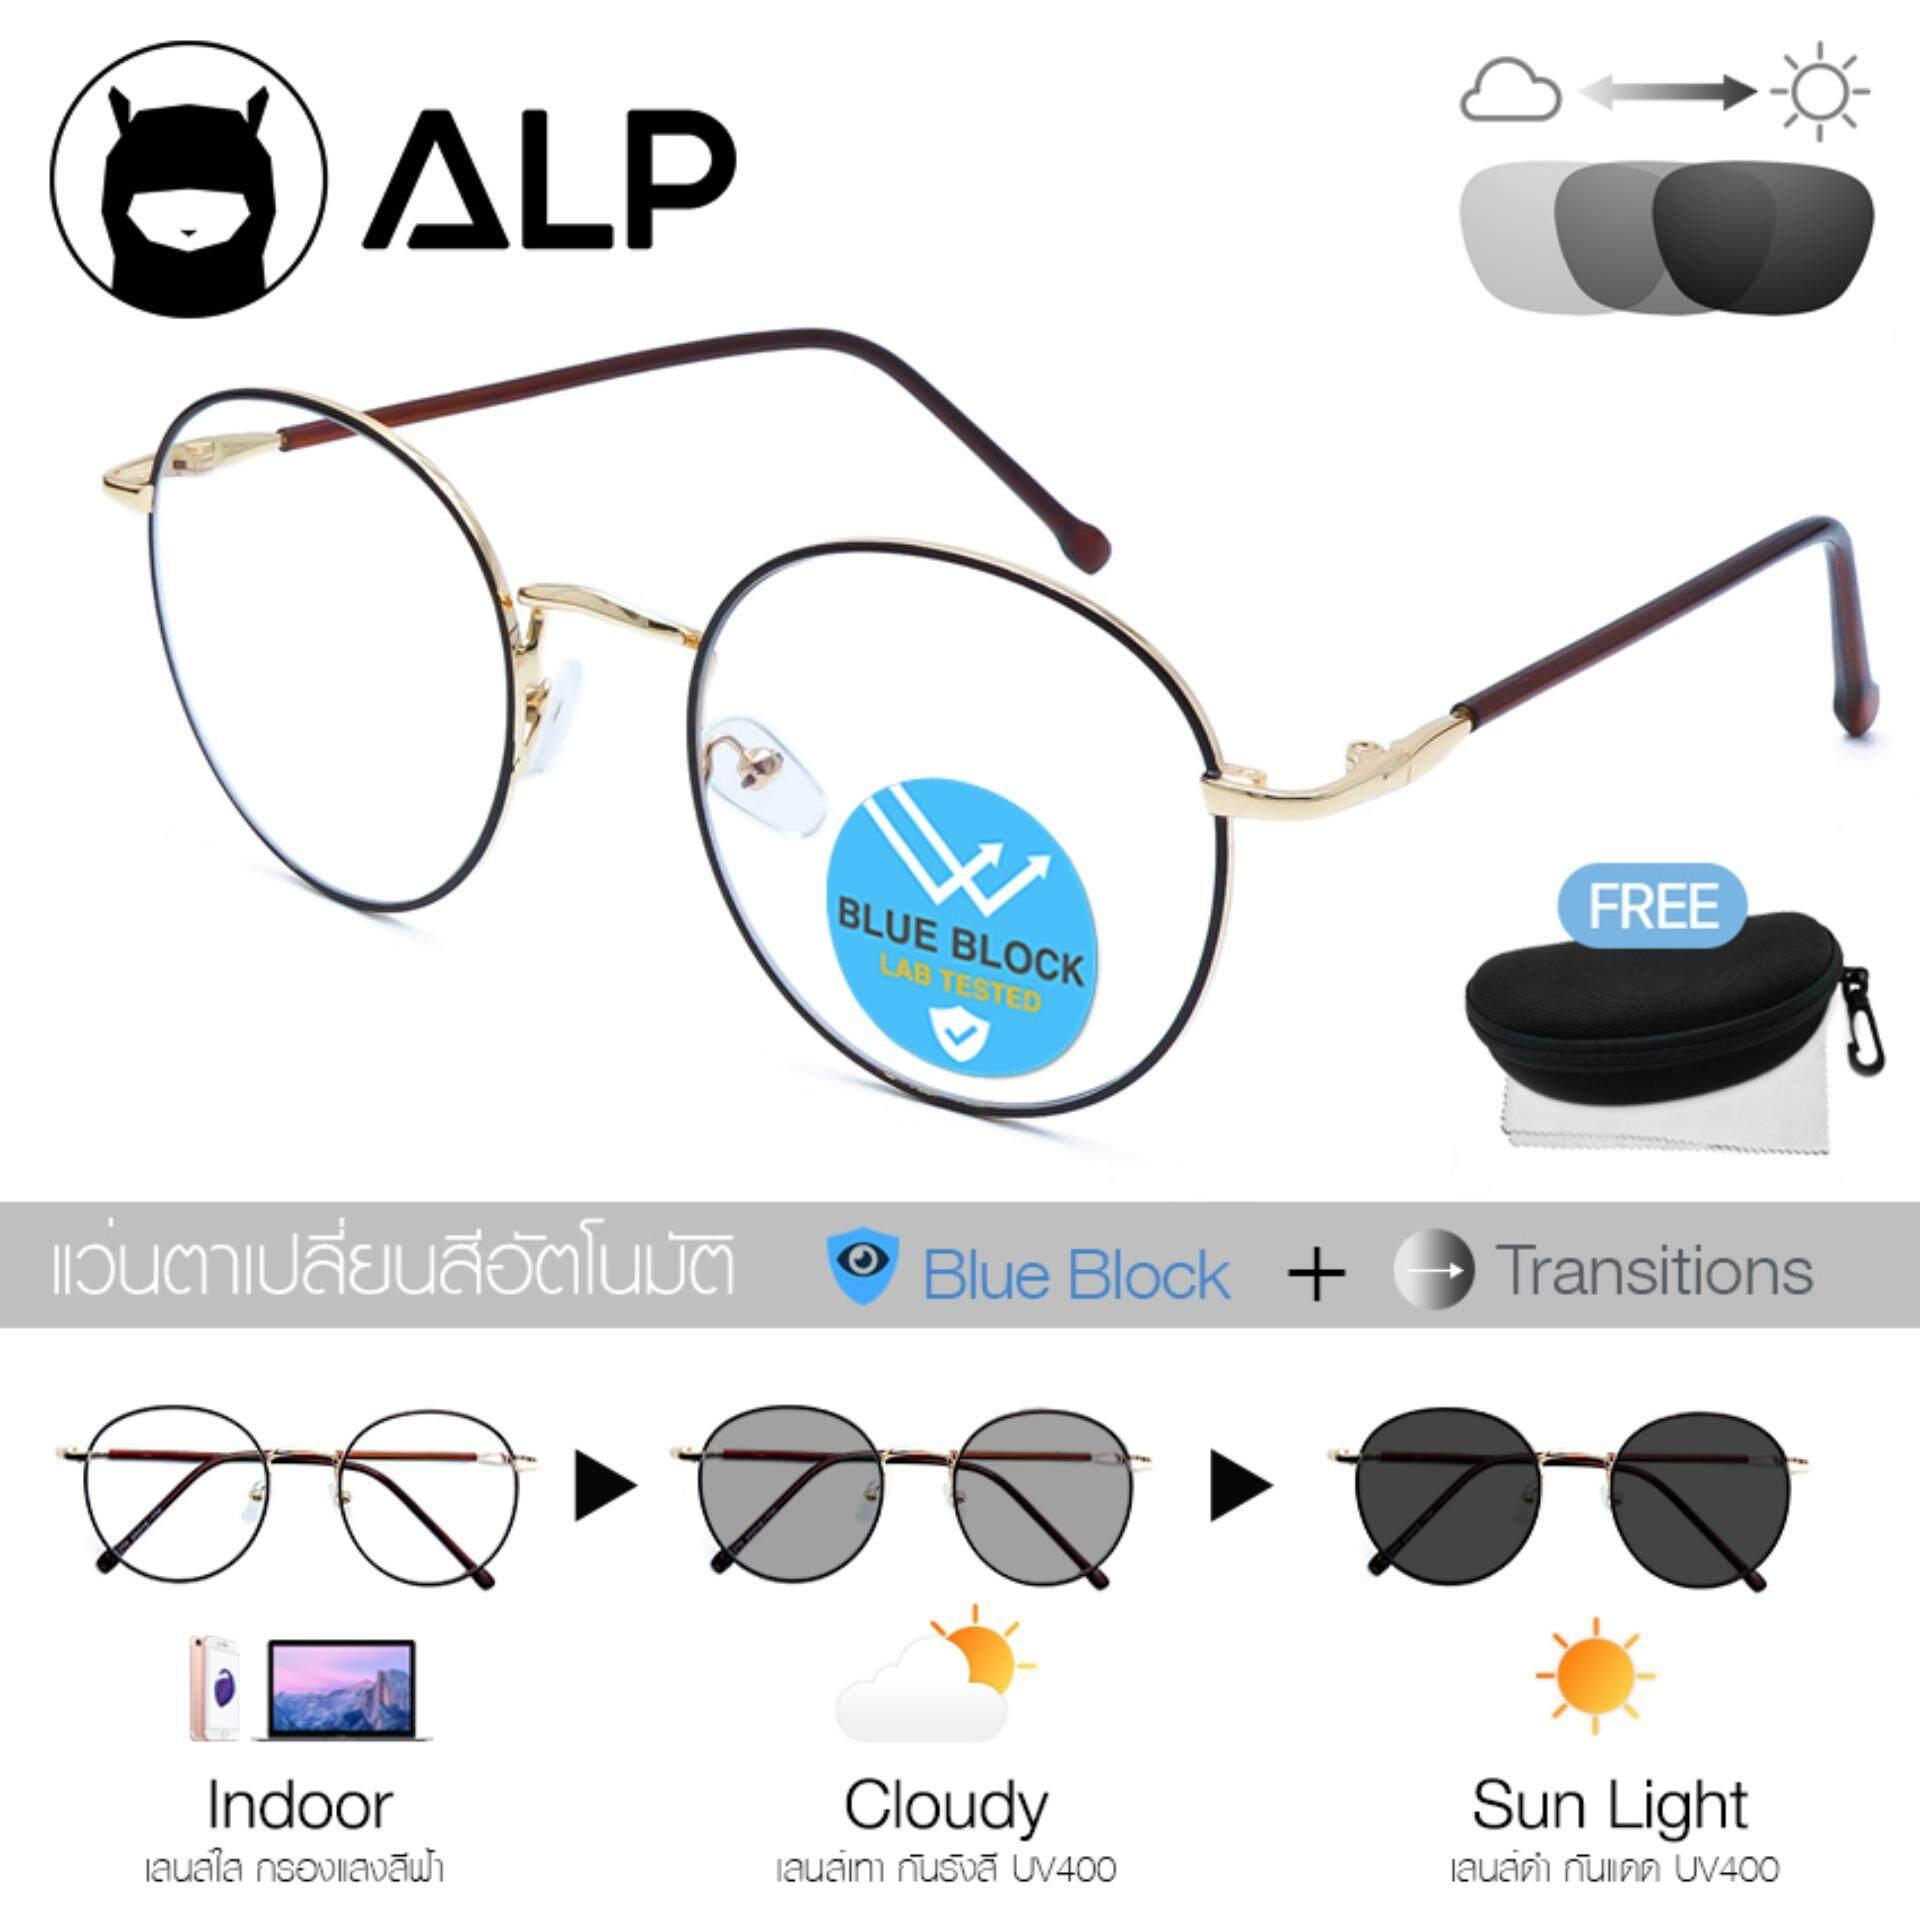 Alp Blue Block Transition Glasses แว่นกรองแสง เลนส์ออโต้ Auto Light-Adjusting Lens กันรังสี Uv, Uva, Uvb กรอบแว่นตา Vintage Style รุ่น Alp-E041 By Alpaca.